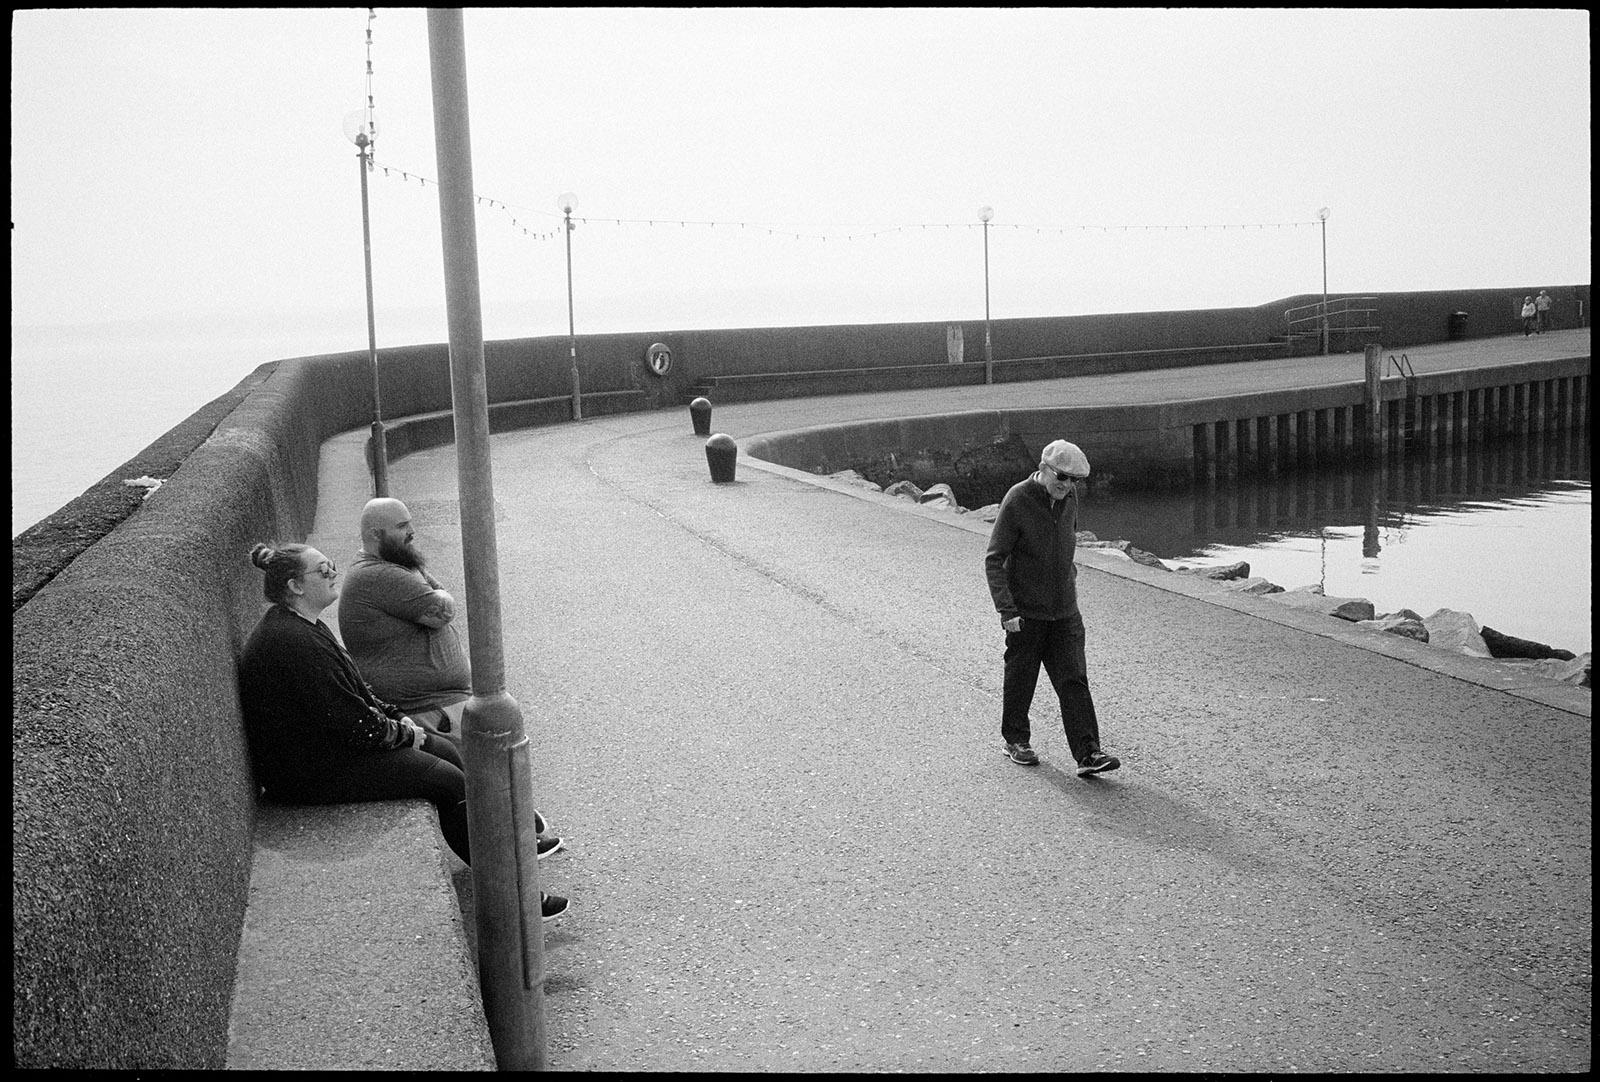 GB. Northern Ireland. Carrickfergus. 2019. Breakwater at the harbour.